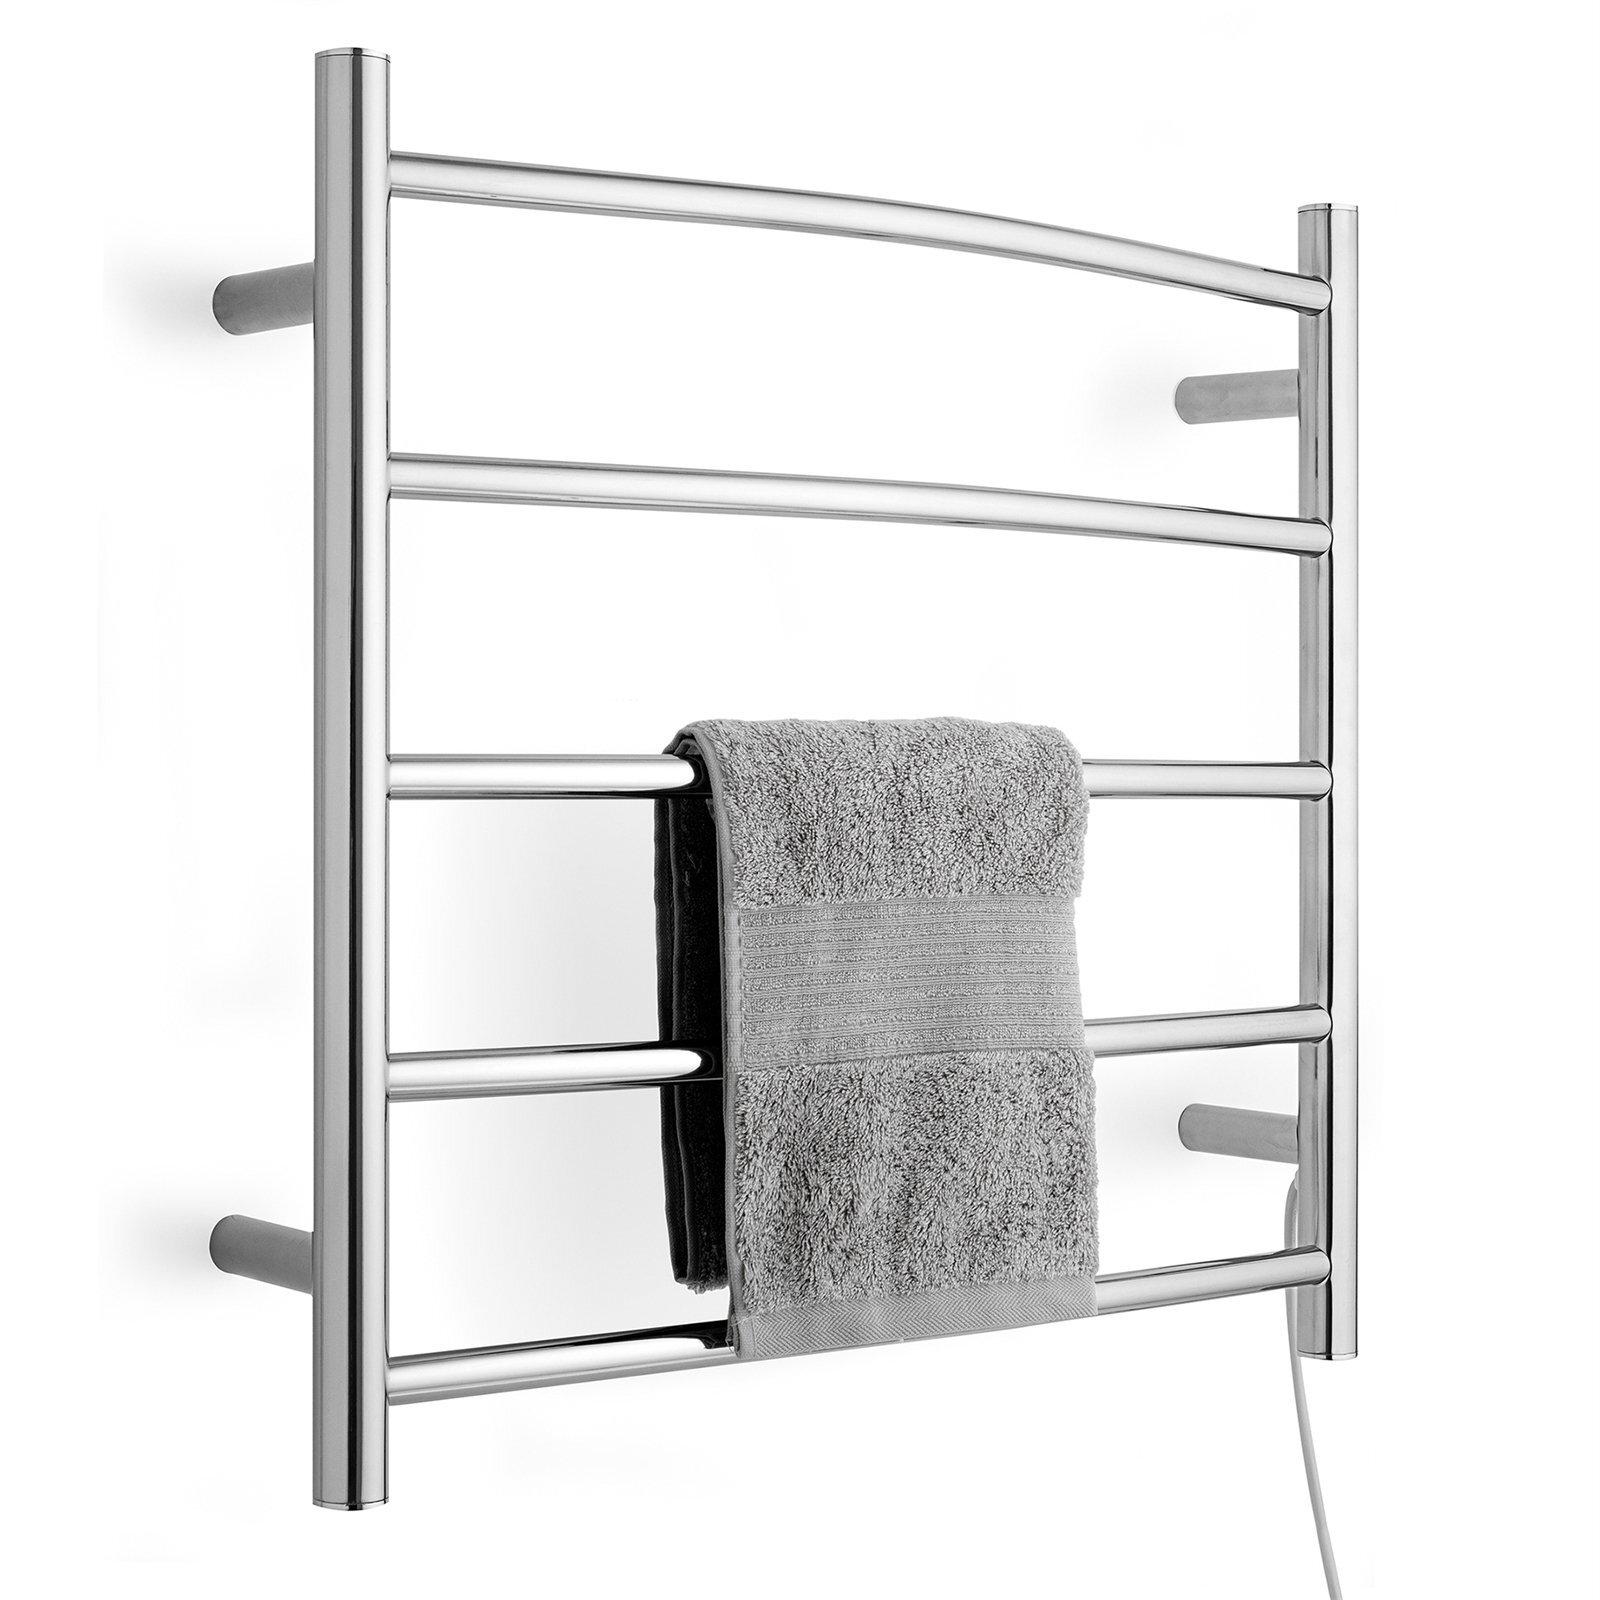 Arlec 5 Bar 40W Stainless Steel Heated Towel Rail